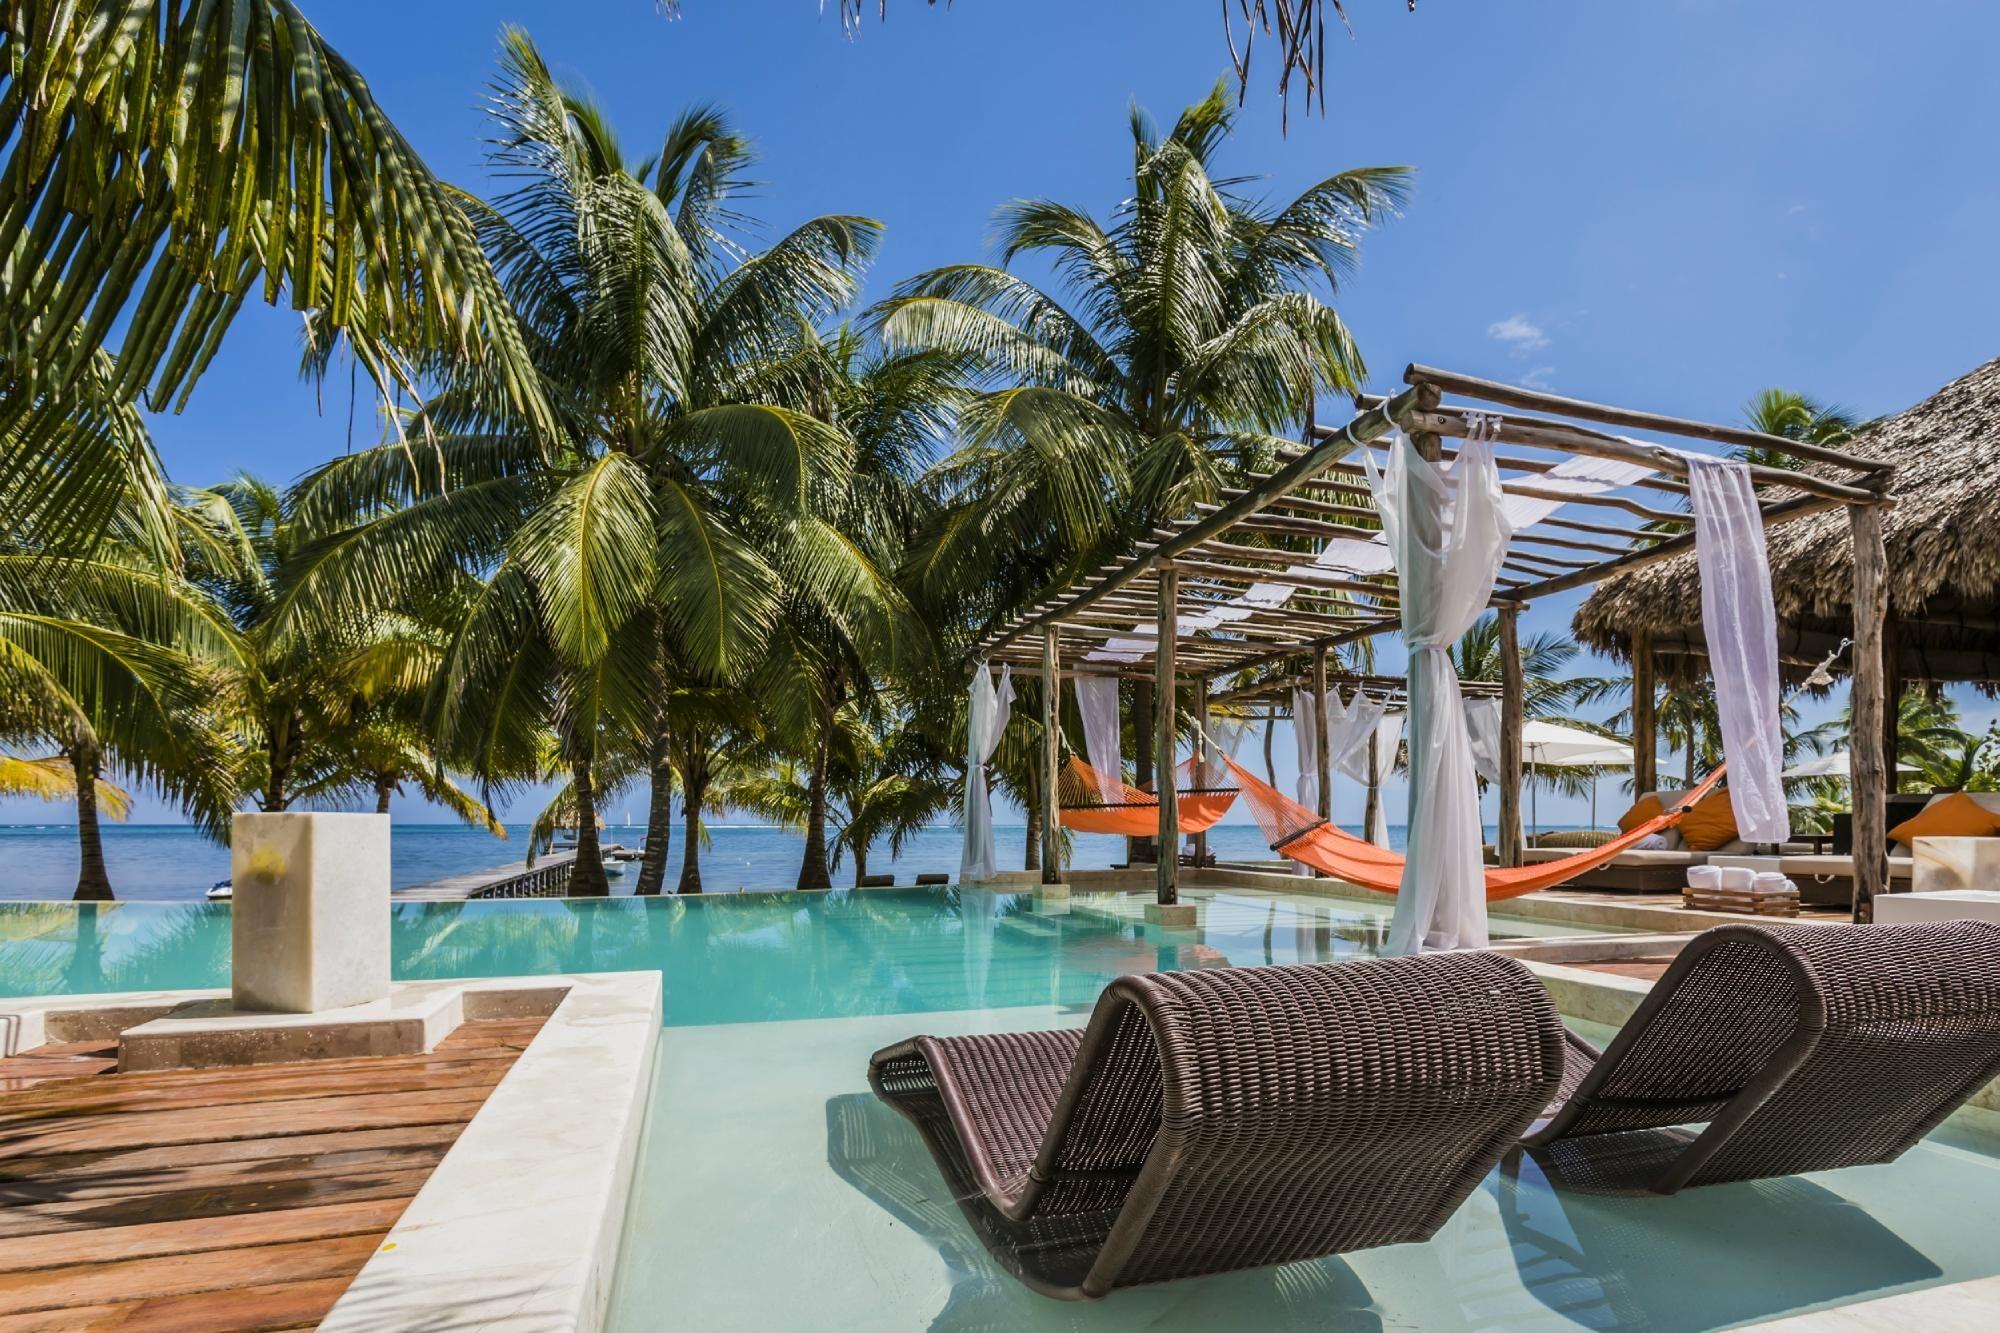 Hotel El Secreto Ambergris Caye Belize